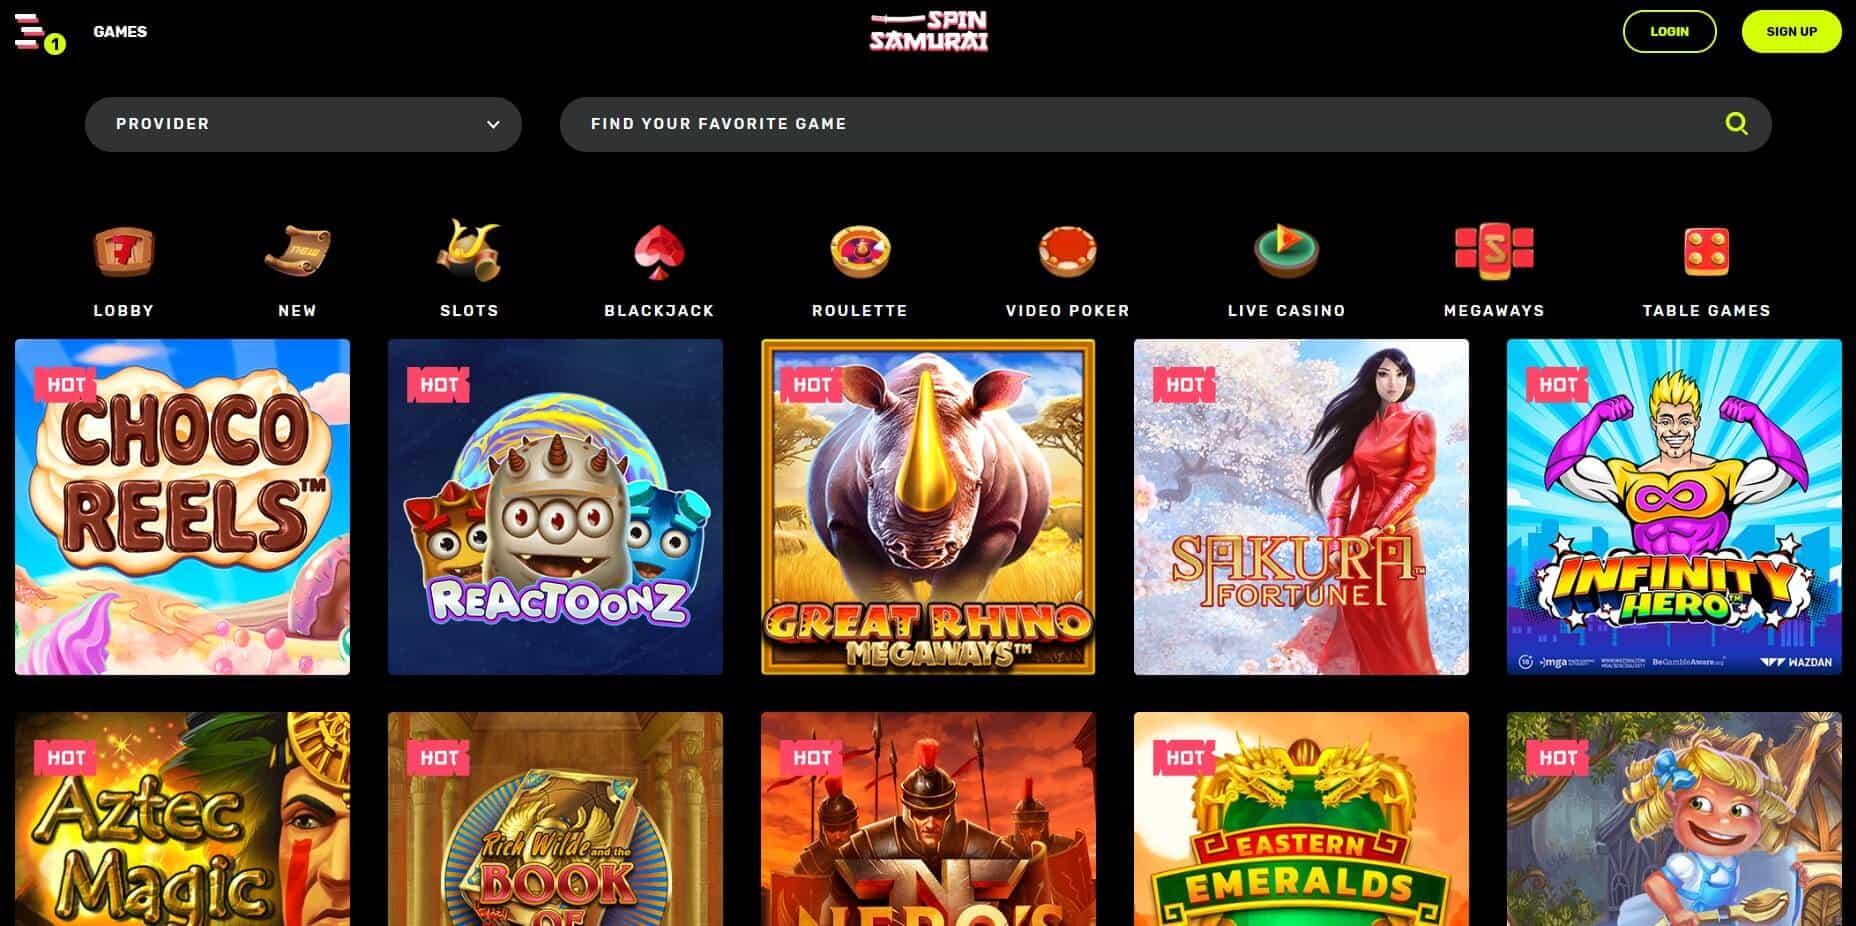 Spin Samurai Casino games